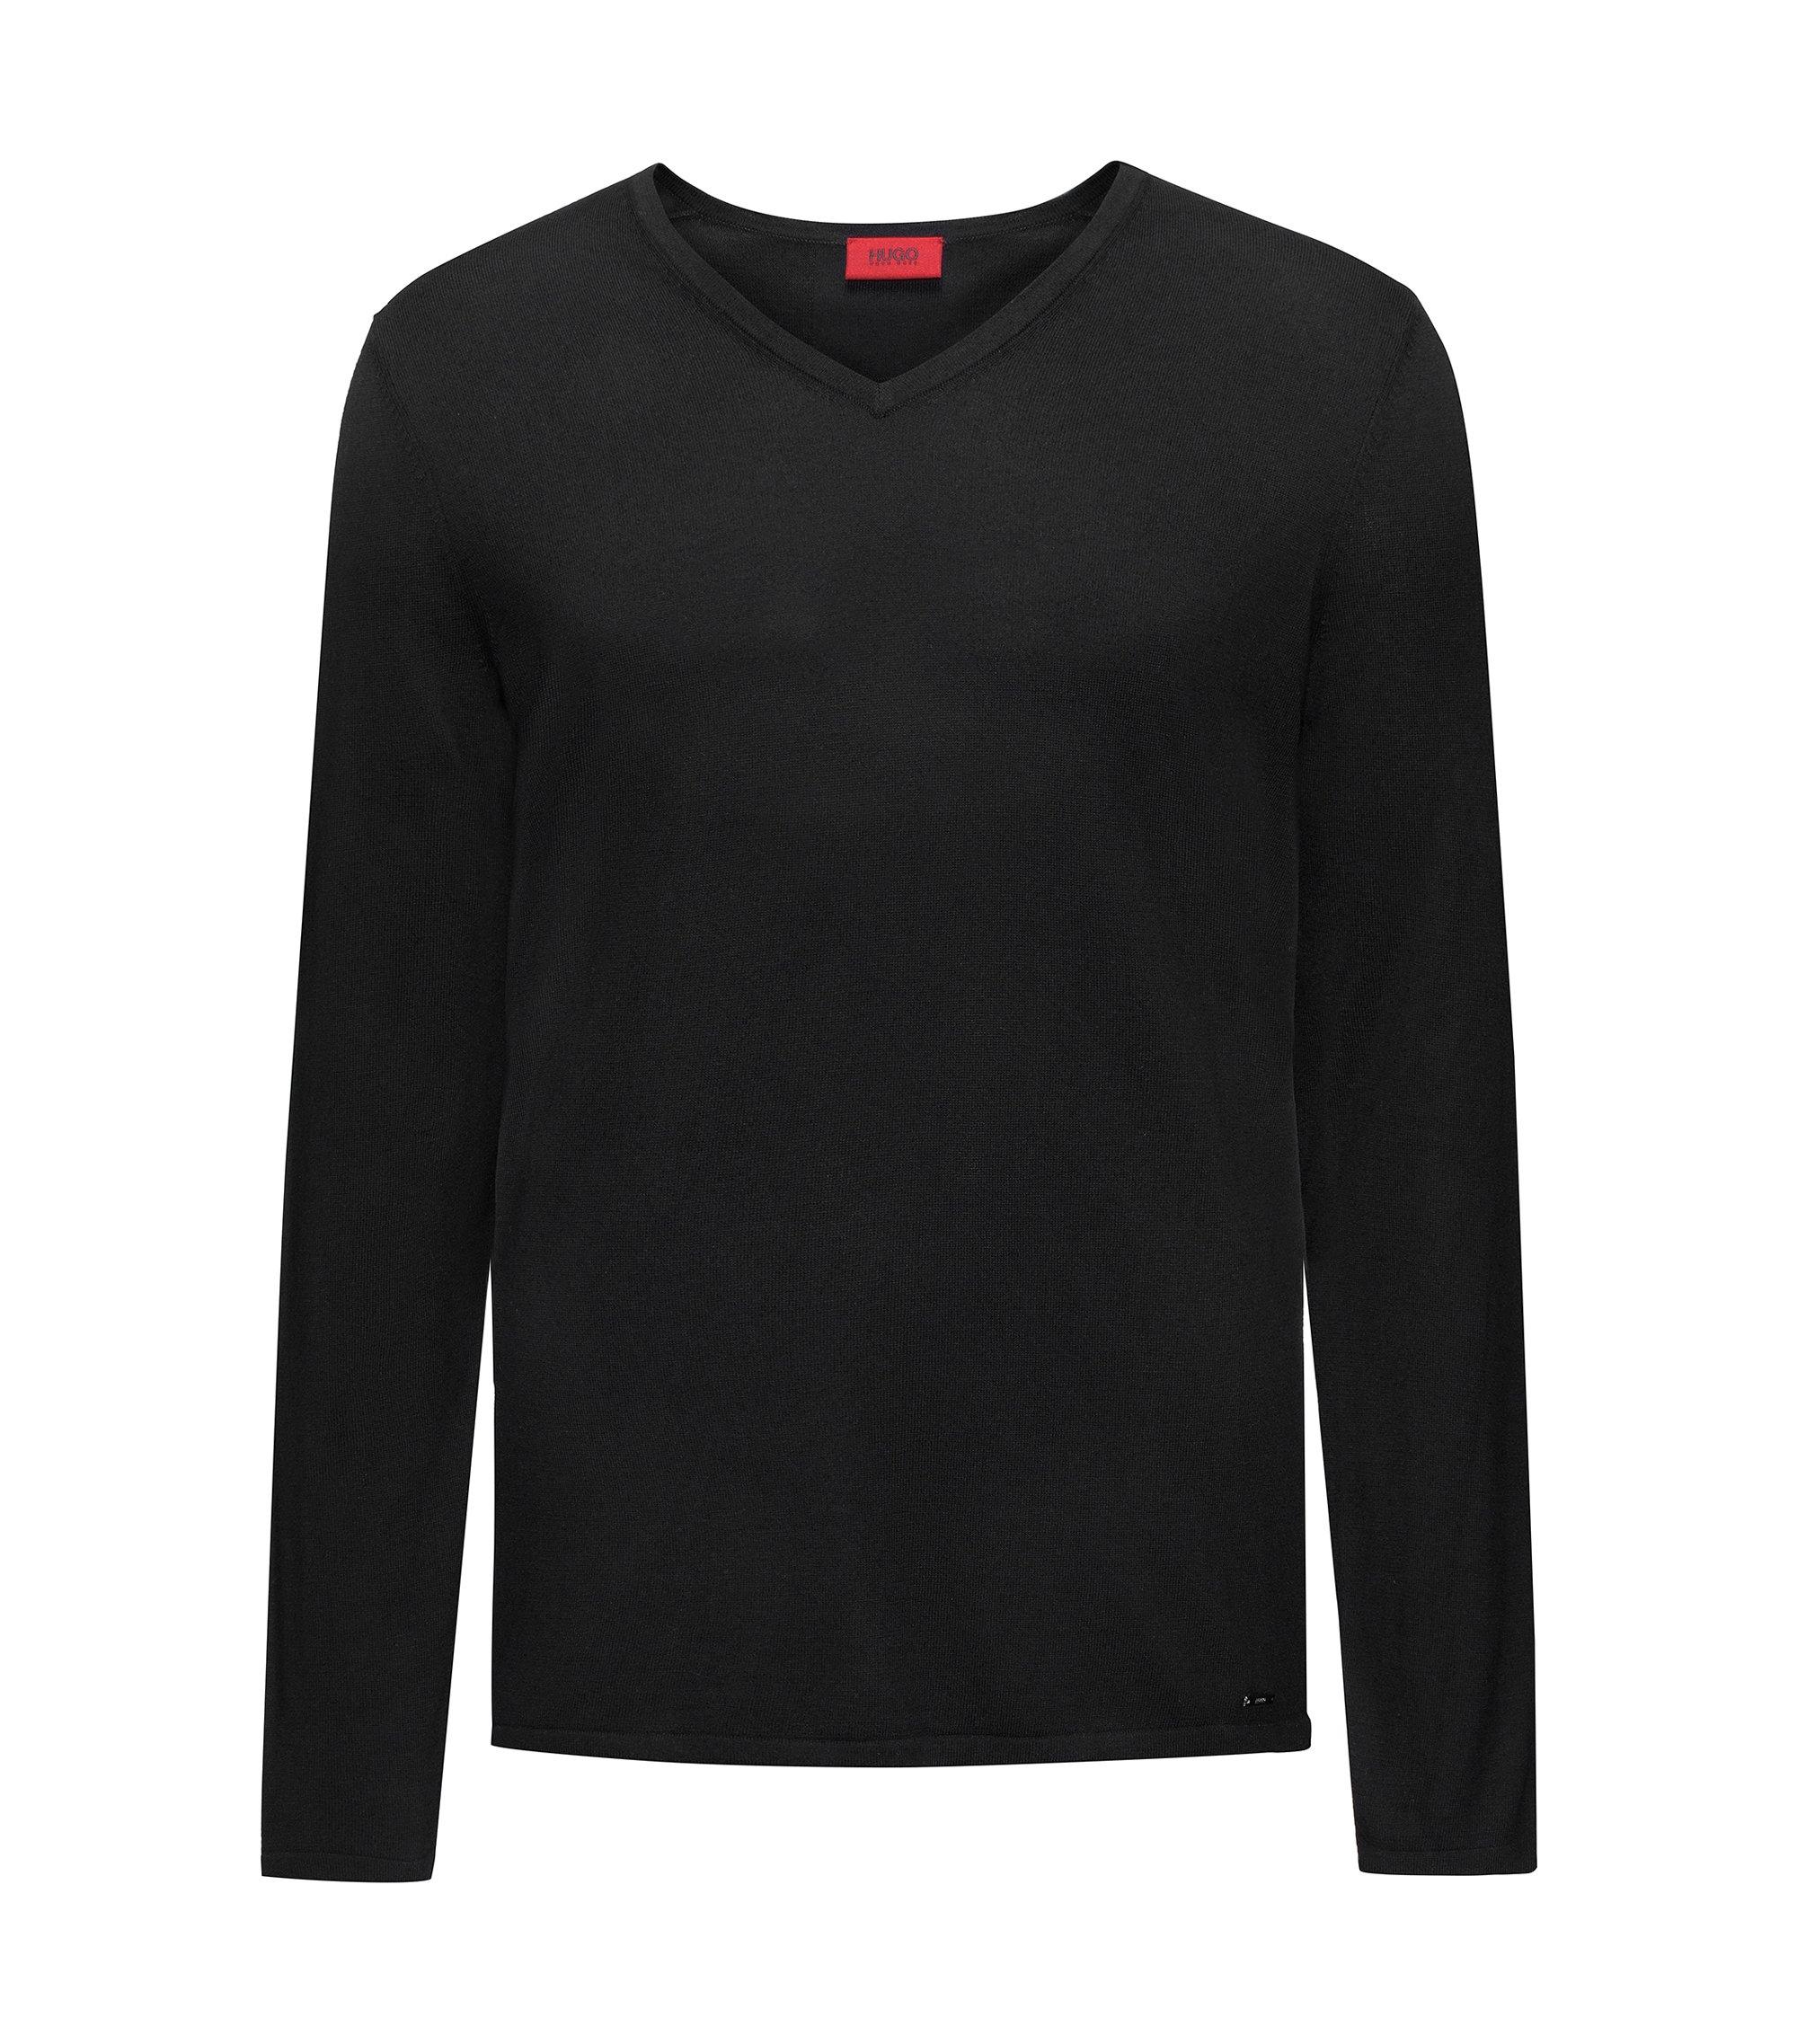 V-neck sweater in a cotton blend, Black